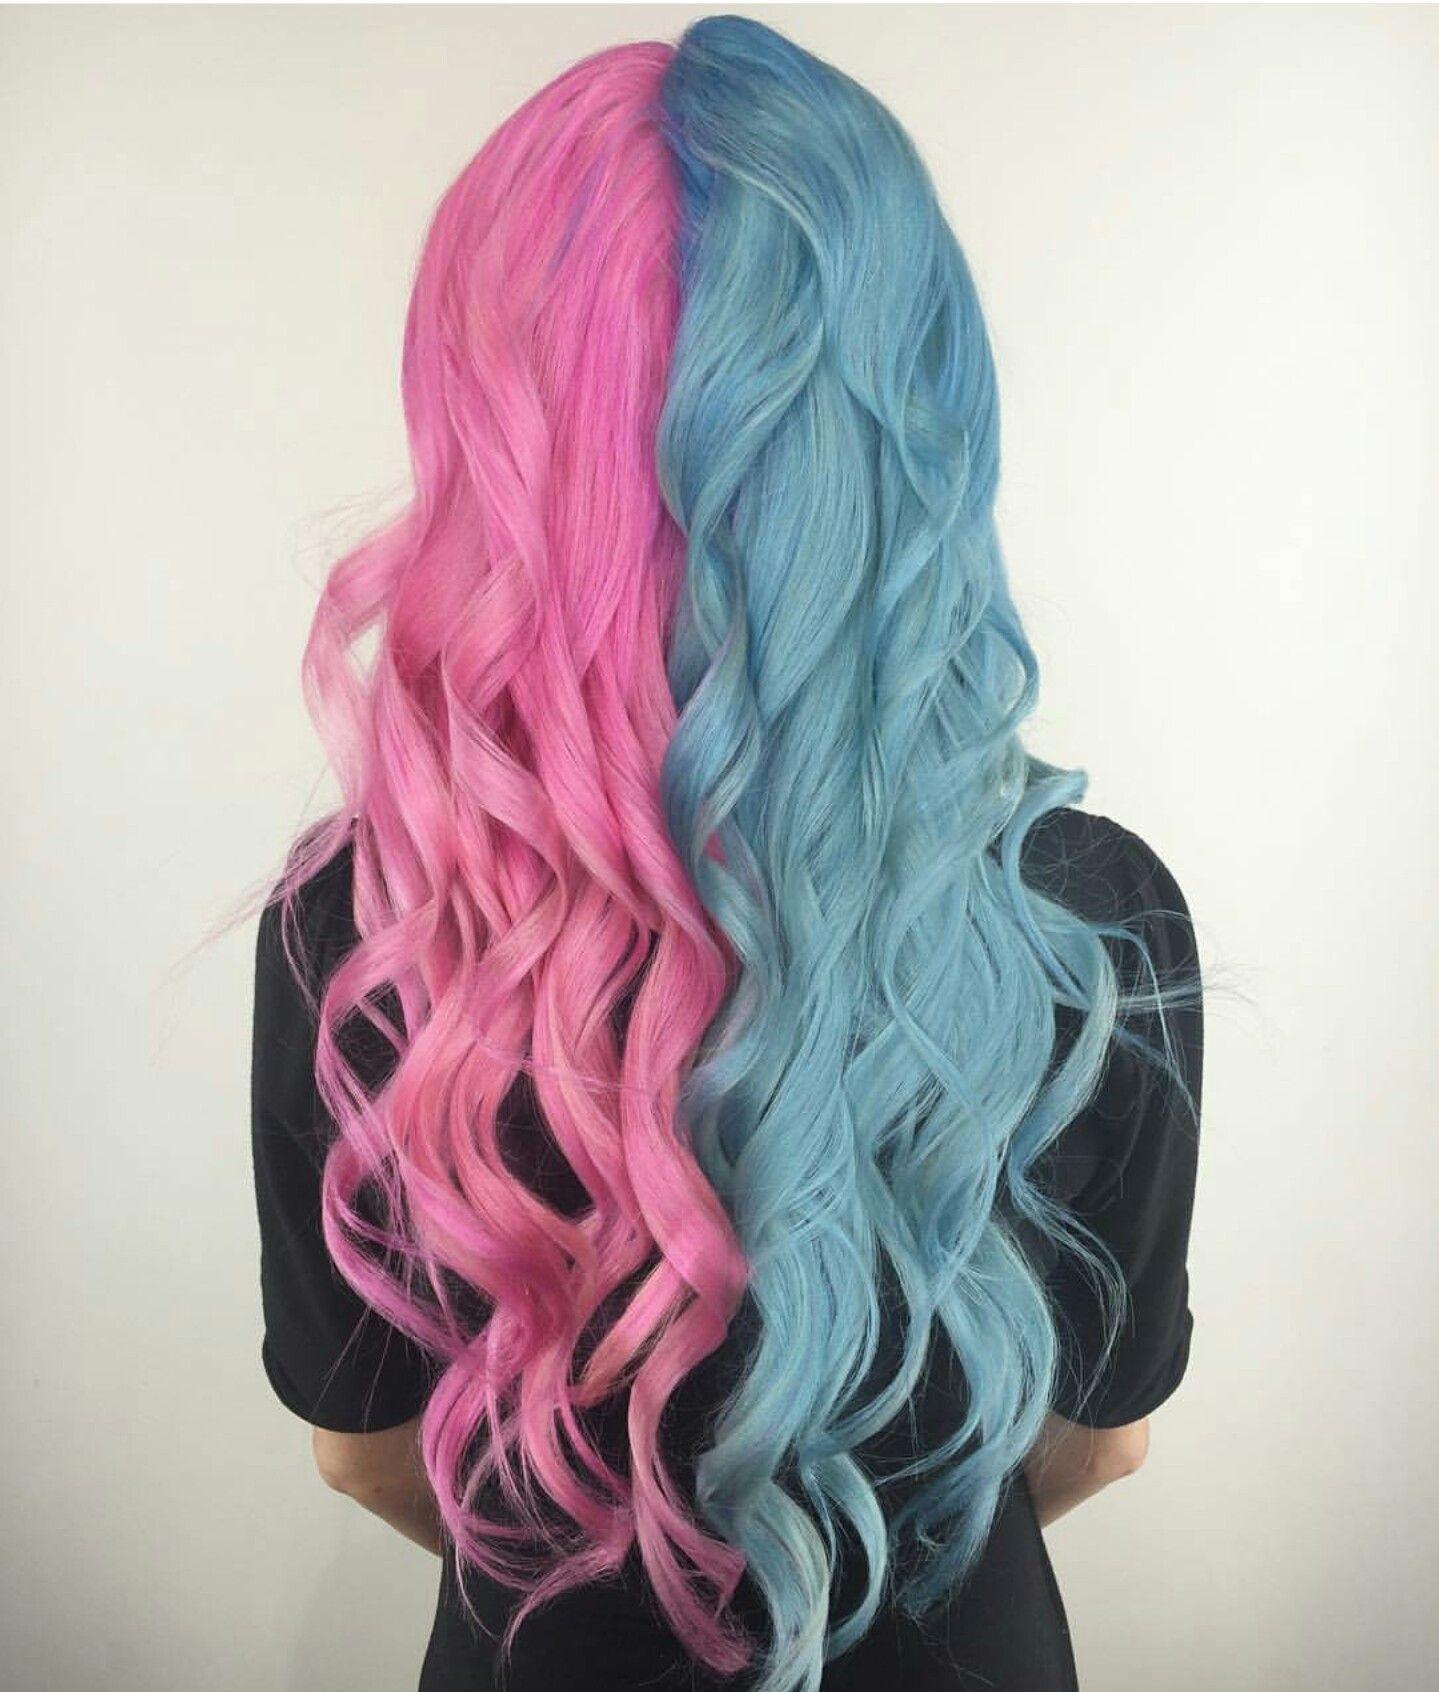 Pinterest faithdalaney hair ideas pinterest hair coloring